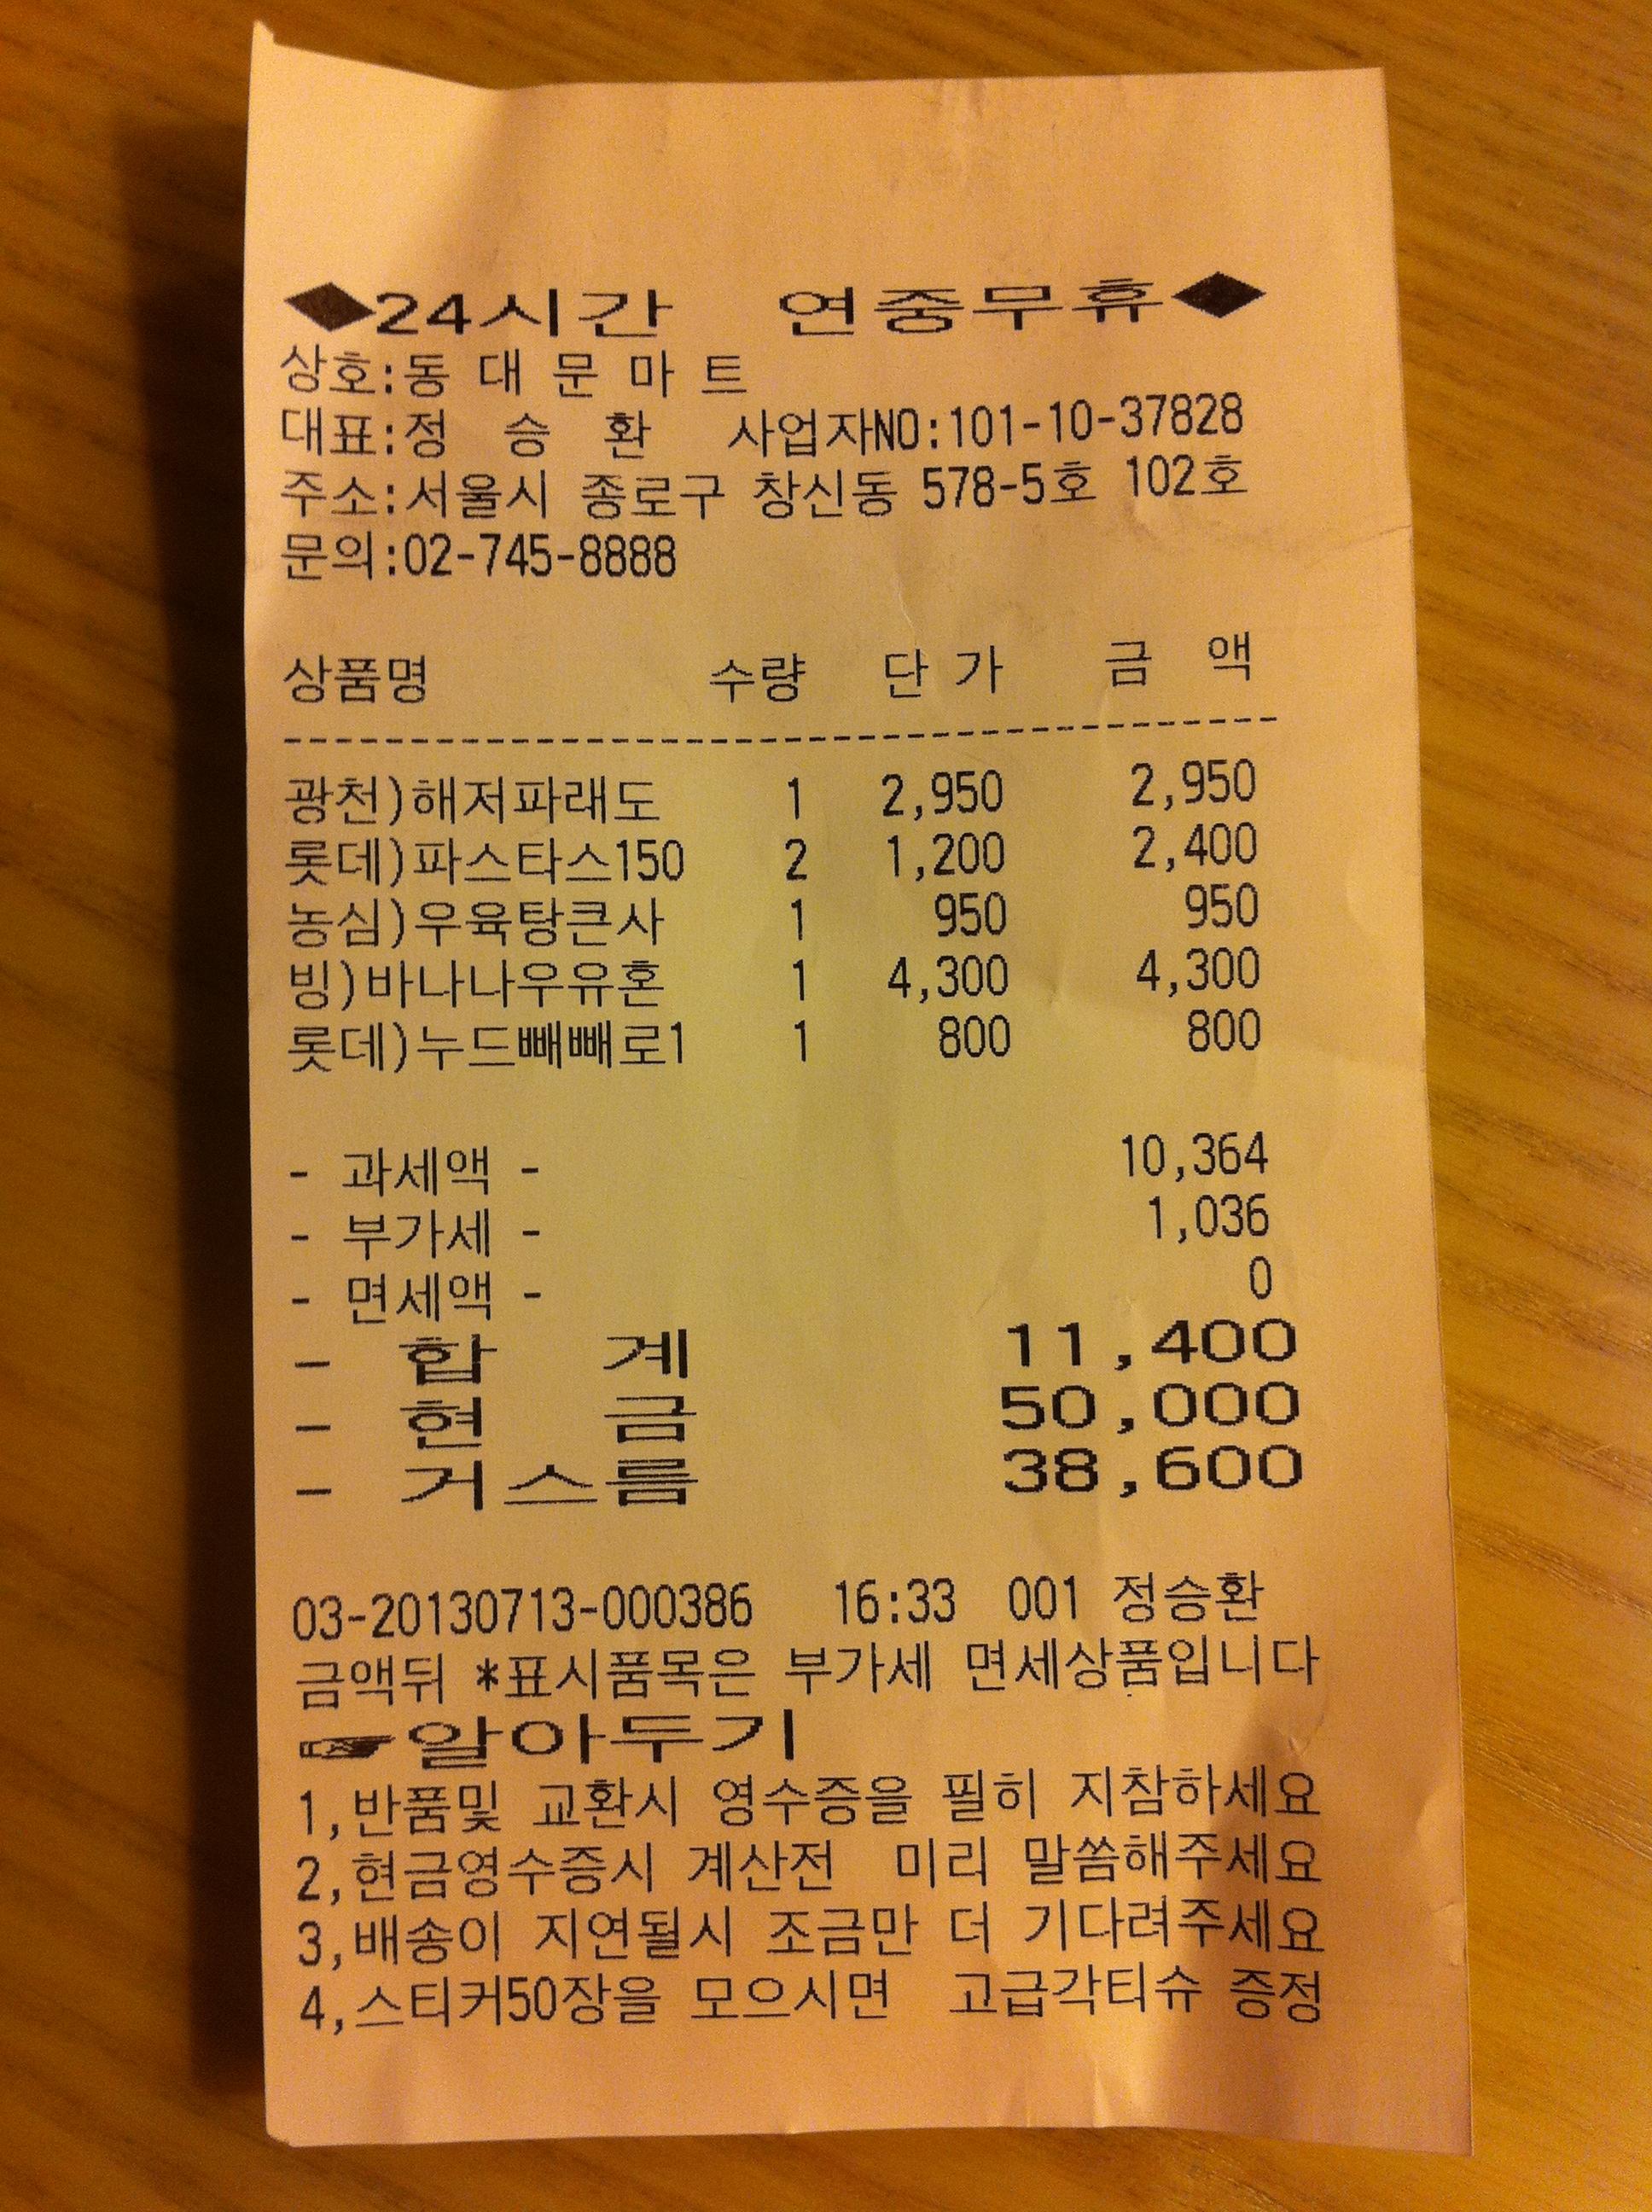 Korean Invoice Template Parablesco - Invoice template for word 2013 korean online store